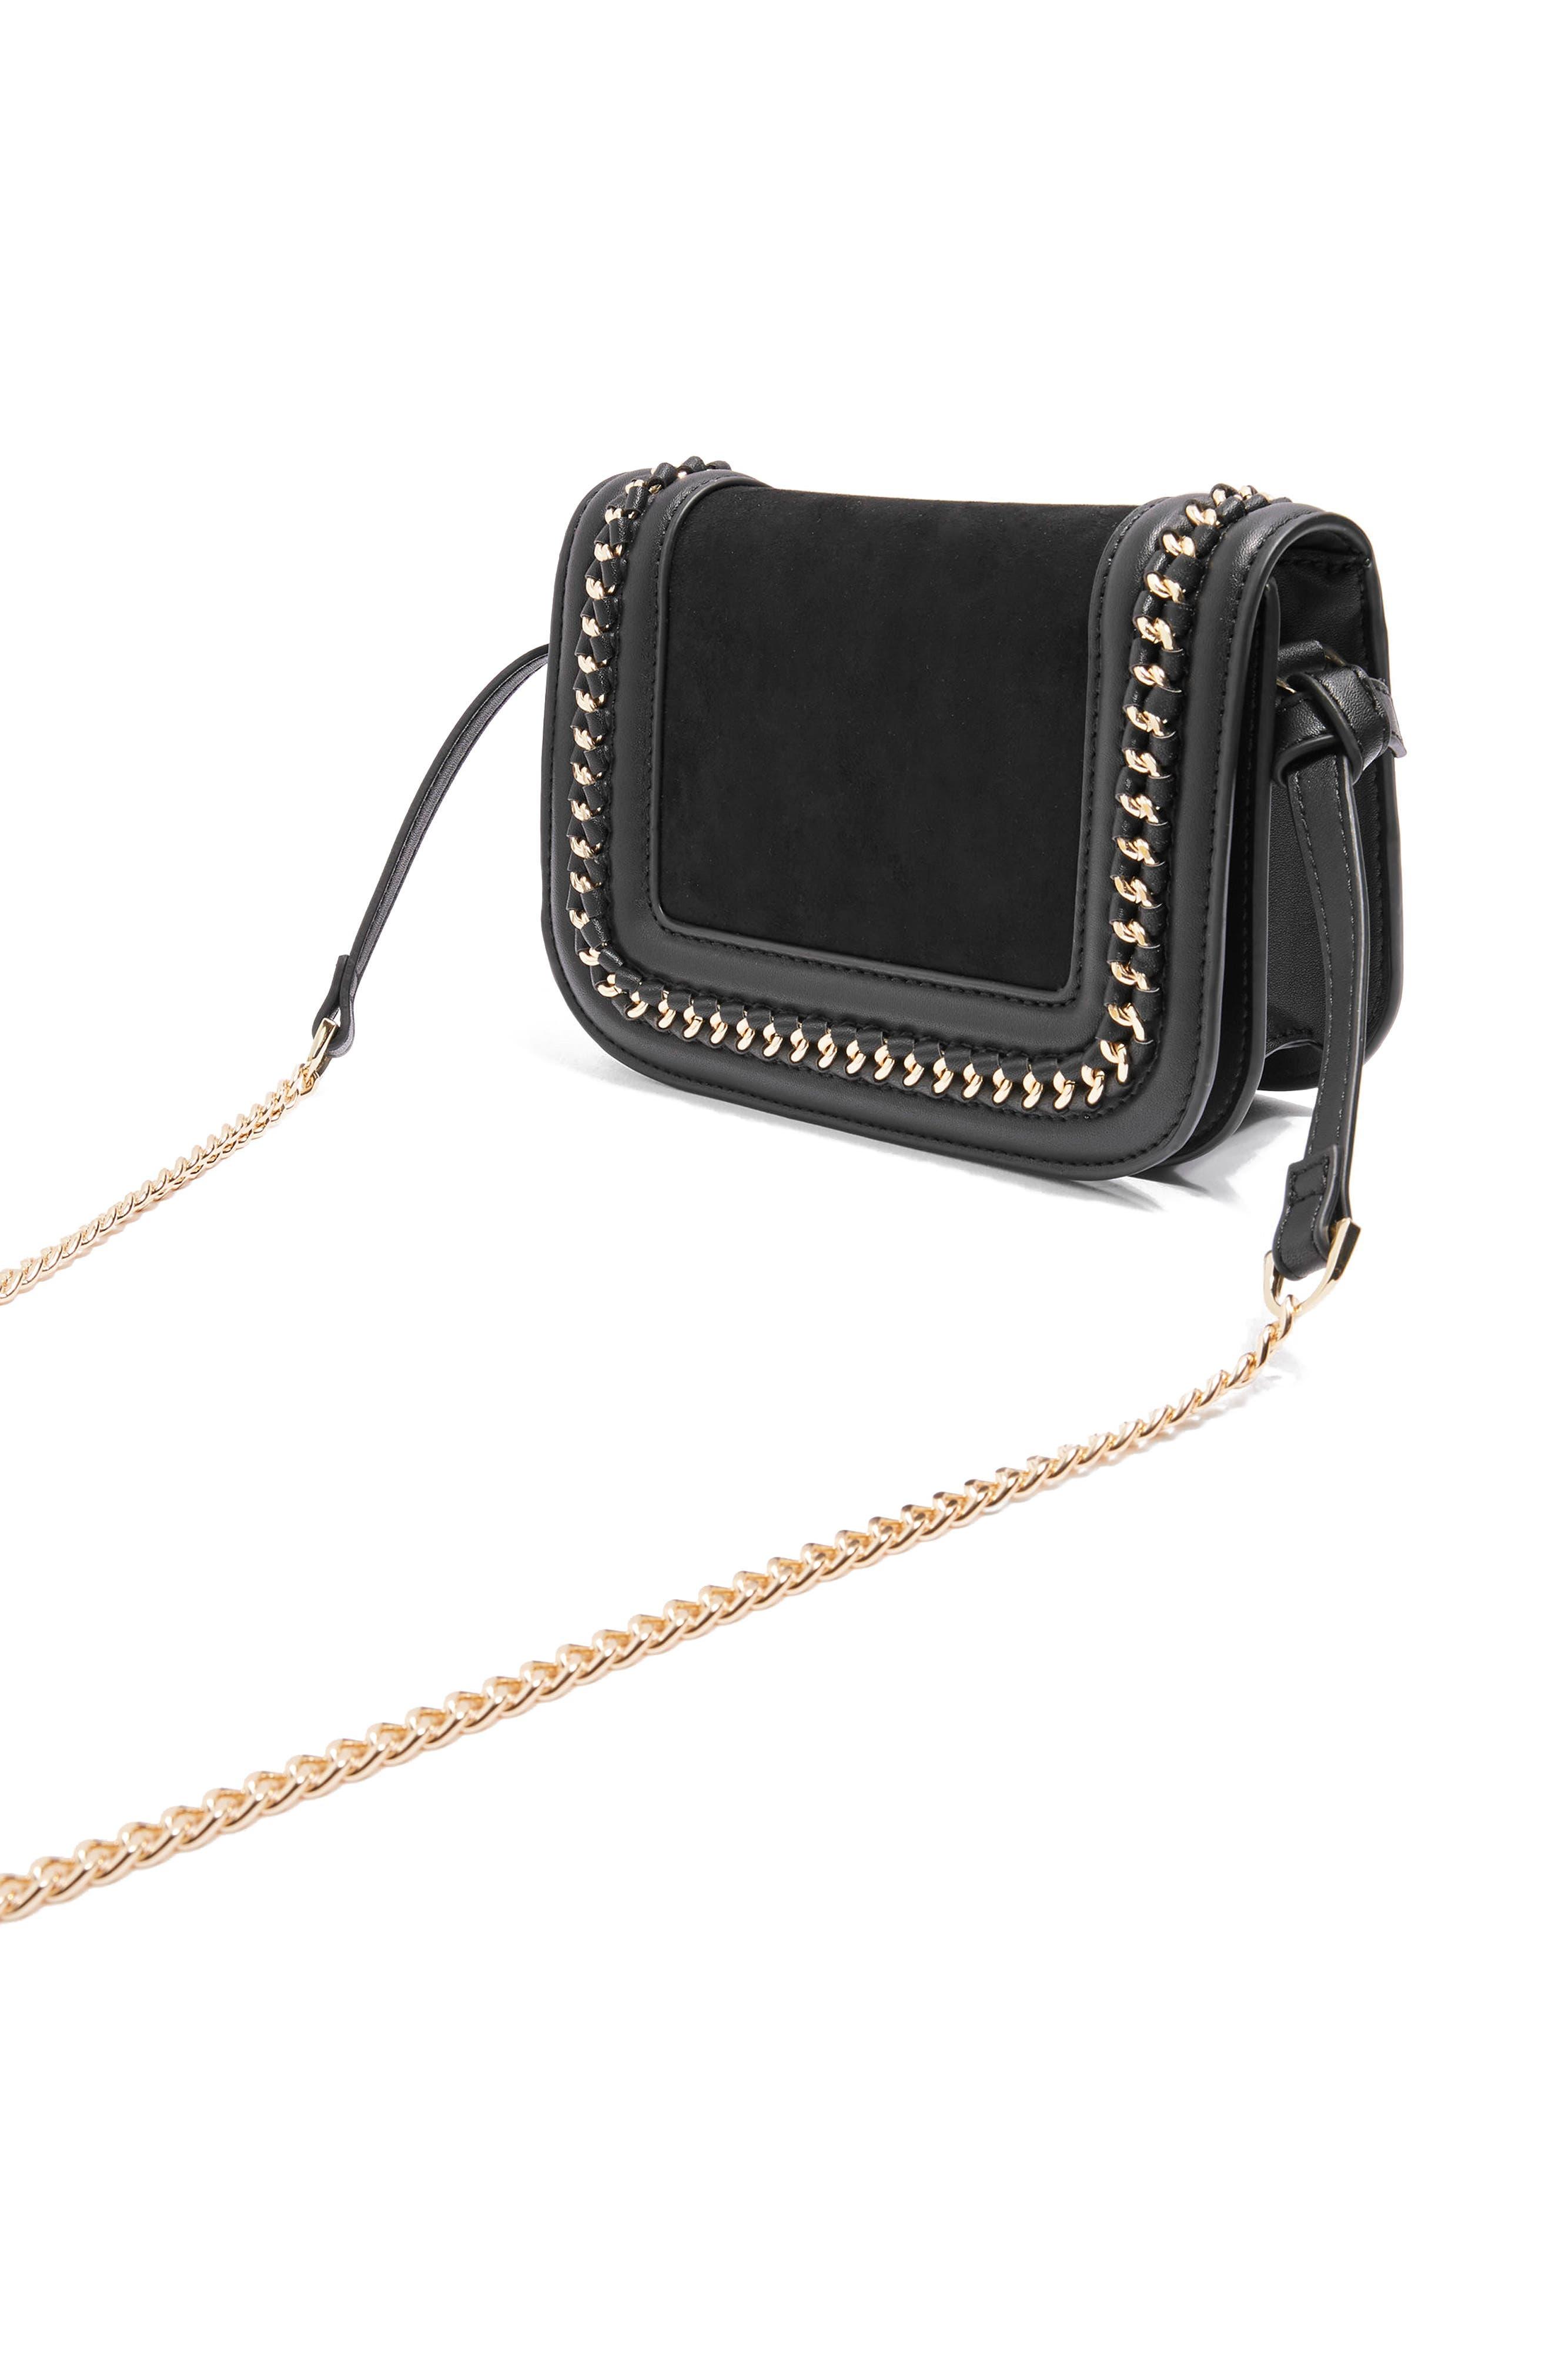 Carmel Chain Flap Crossbody Bag,                             Alternate thumbnail 4, color,                             001